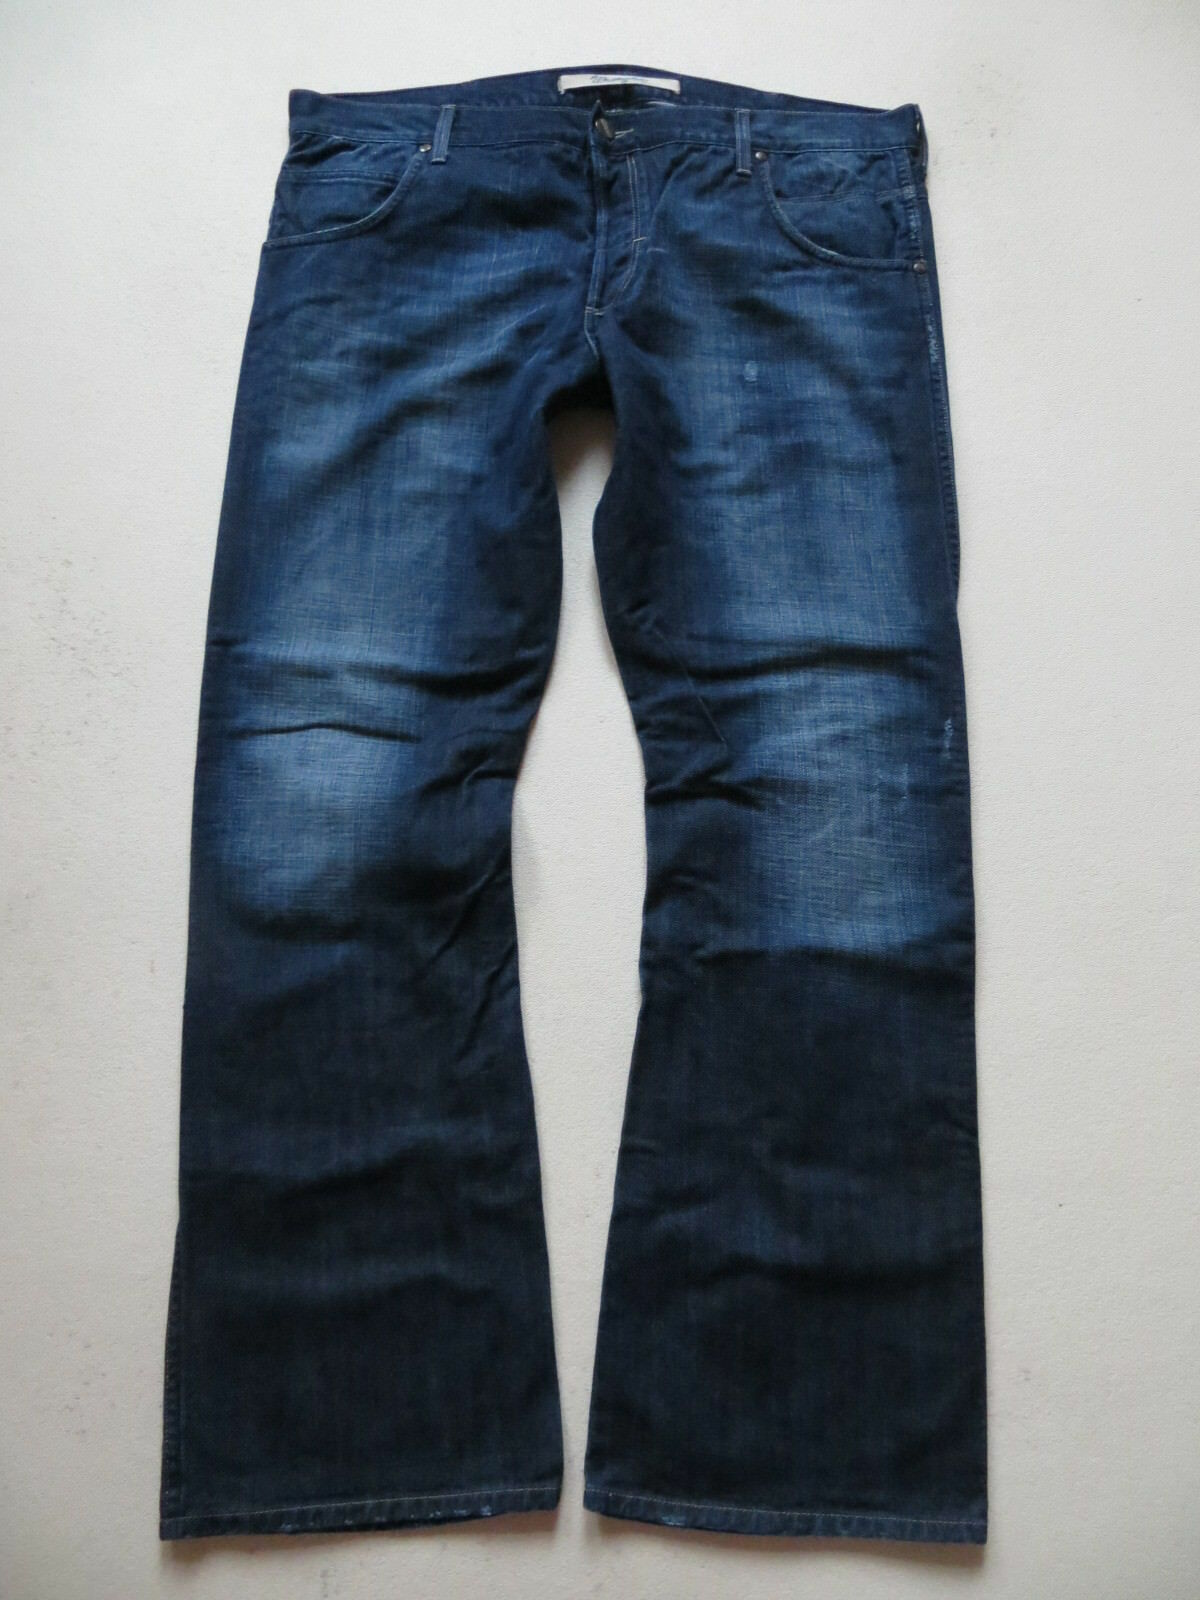 Wrangler SHARKEY Bootcut Jeans Hose W 40  L 34, TOP   dark Vintage X-Low Denim